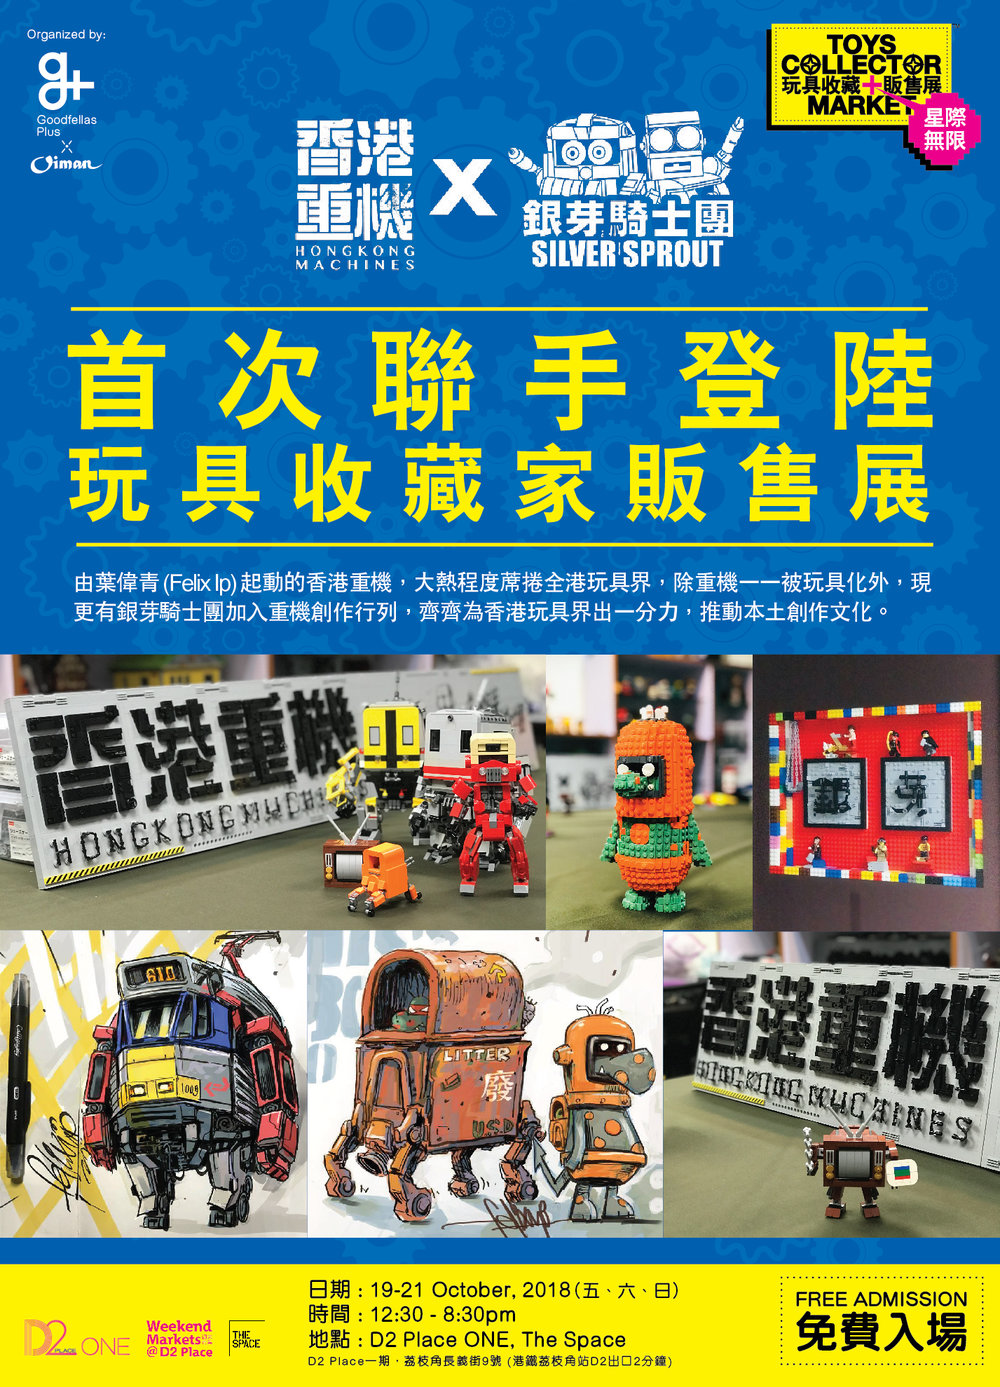 GFP-4thTCM-FBAD-685x950px-Event_HKMxSS.jpg